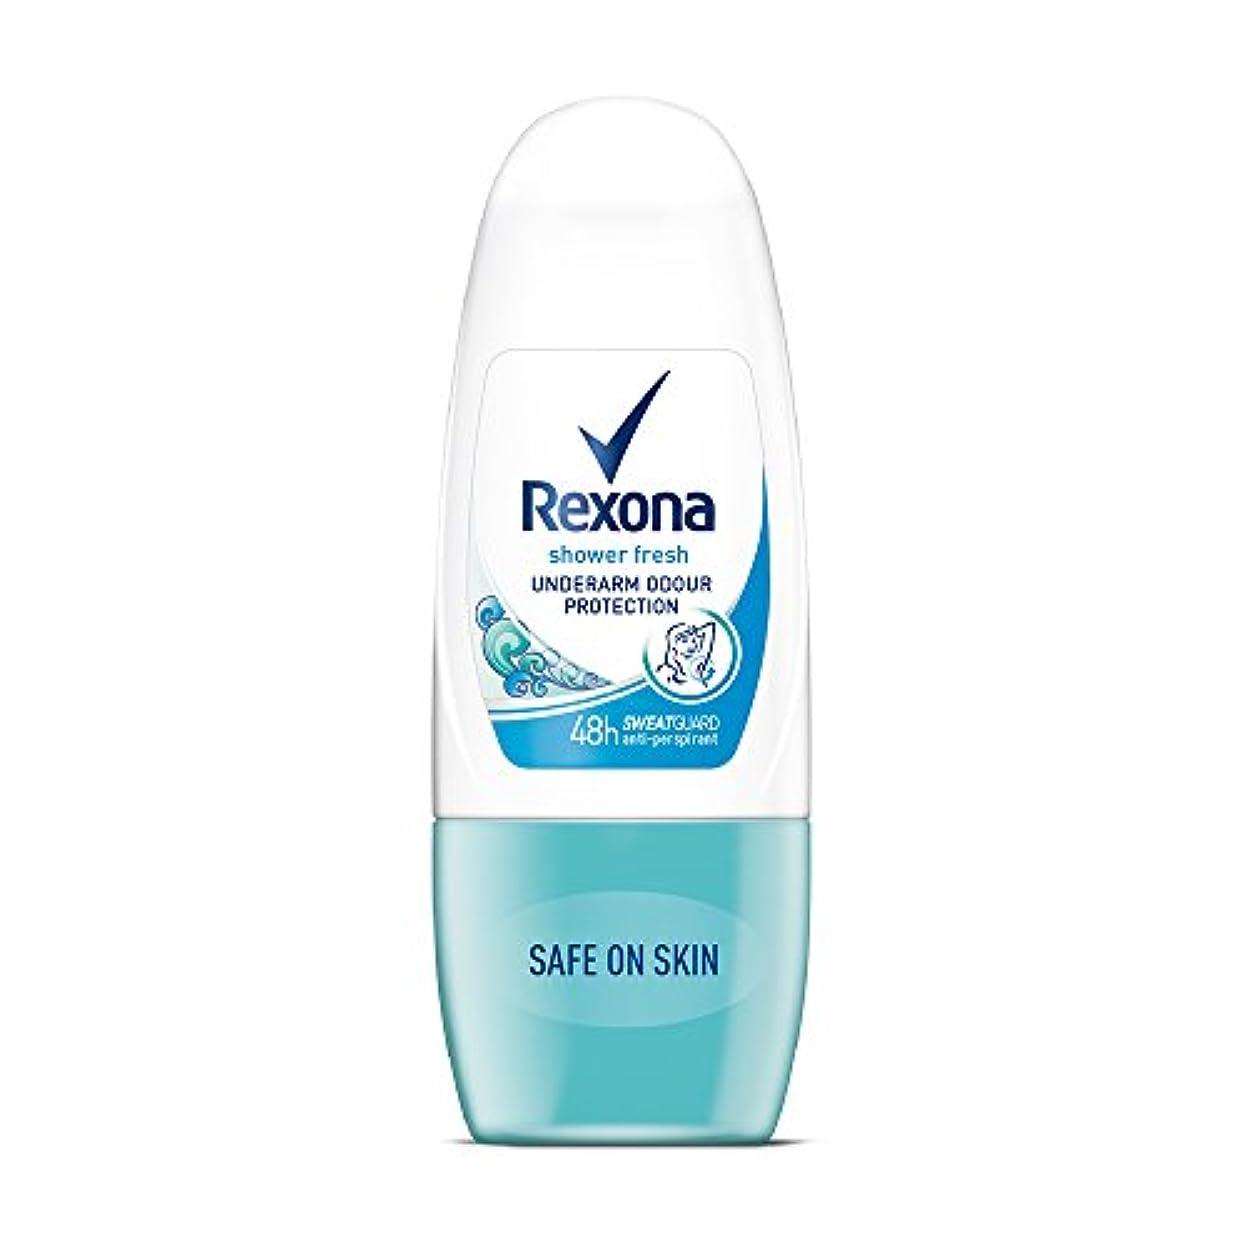 Rexona Shower Fresh Underarm Odour Protection Roll On, 25ml - India